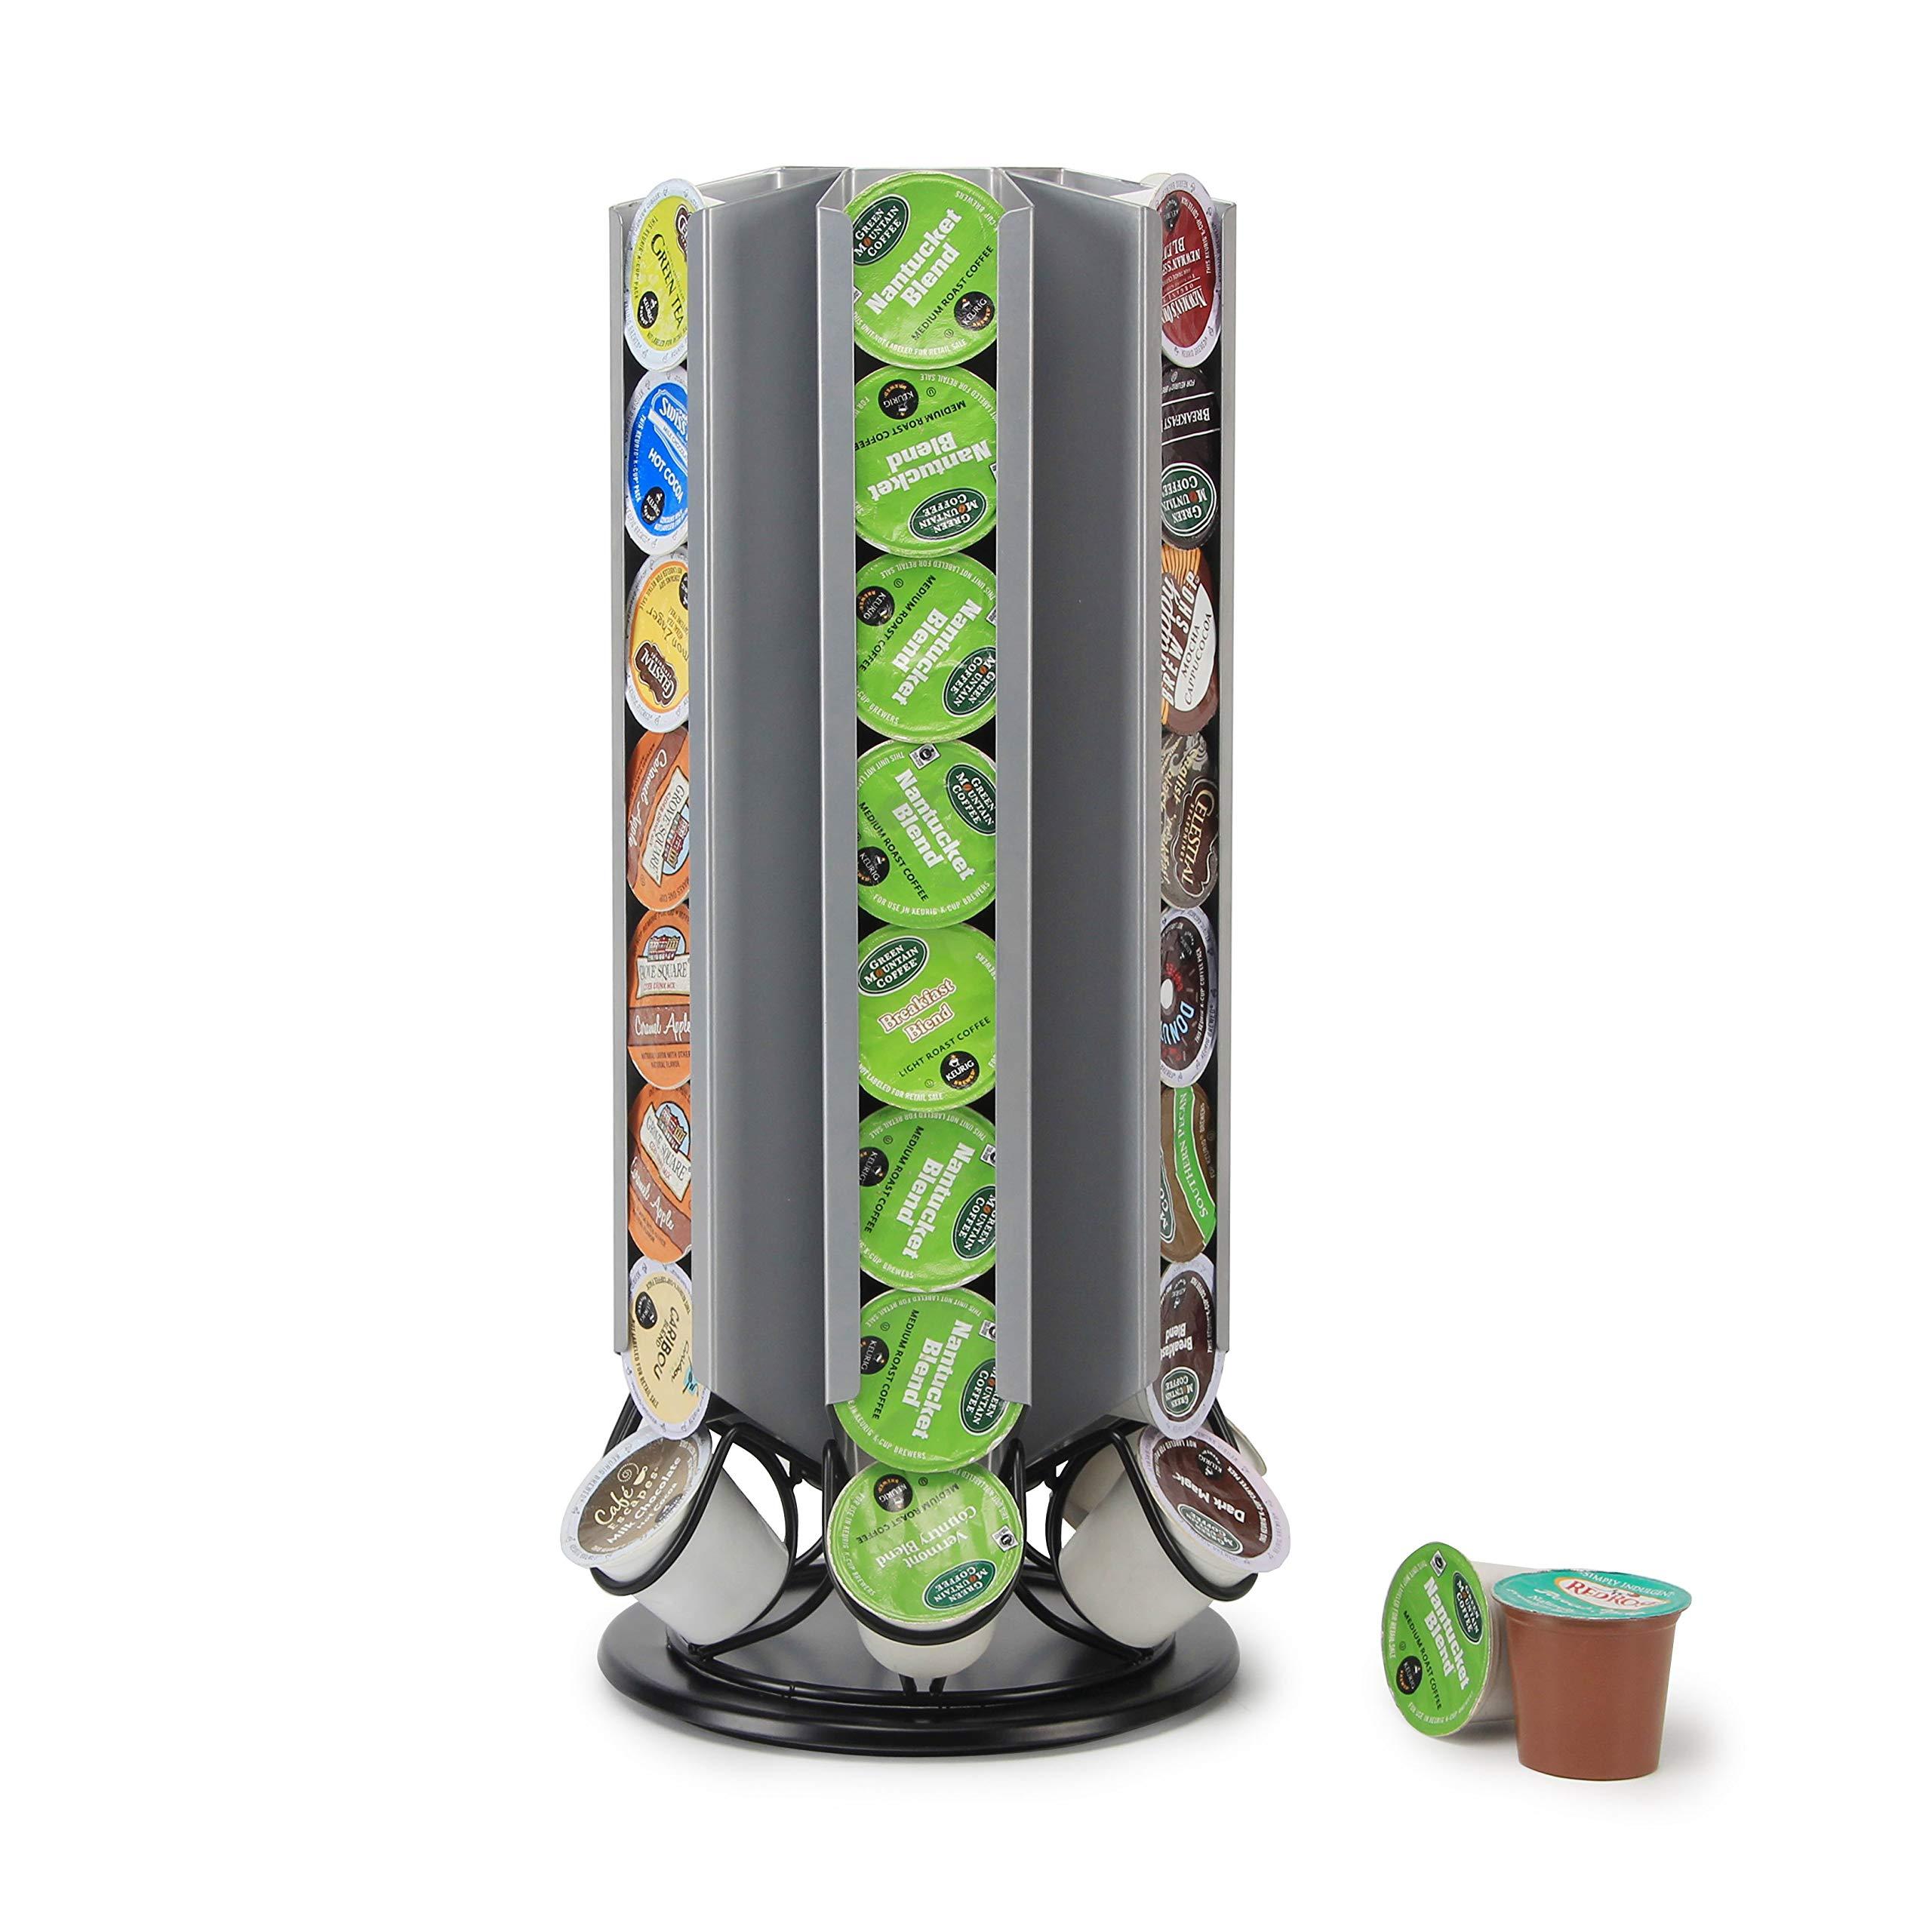 Coffee Pod Holder Revolving Capsules Rack for K-cup Pods (Silver+Black, 48 Pods)